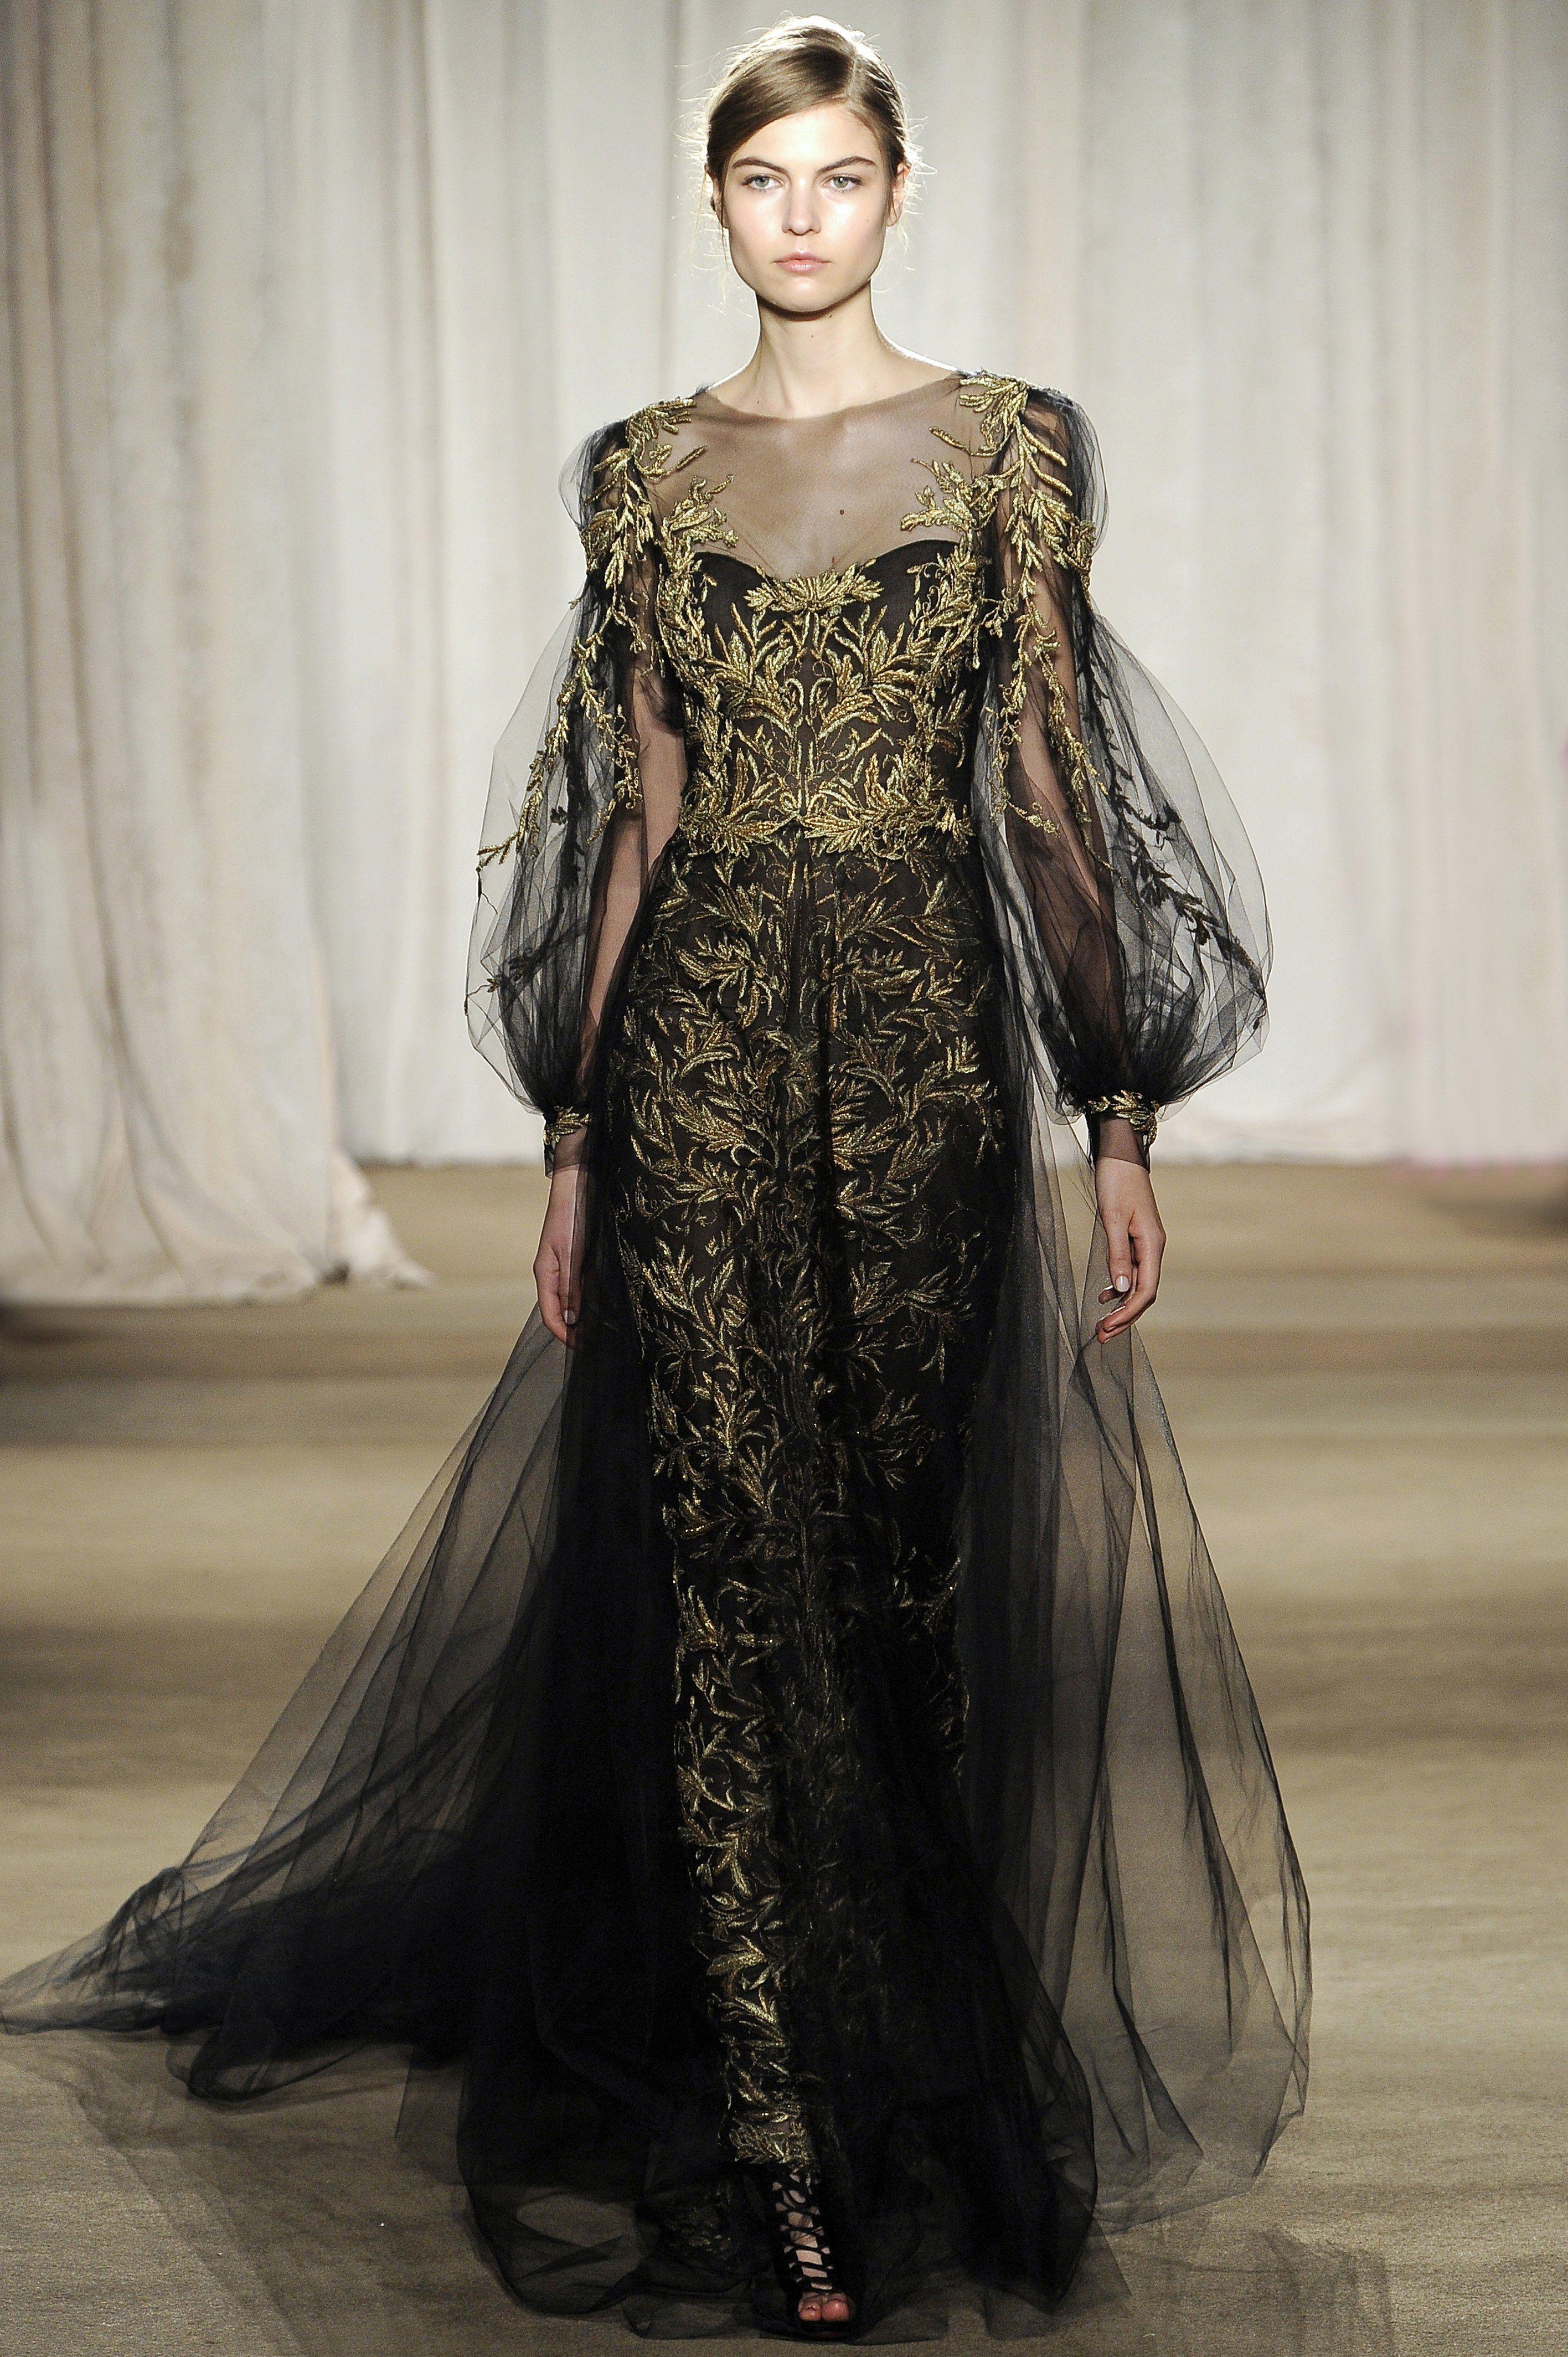 REVLON sponsors the @Marchesa show during Mercedes-Benz NY Fashion Week Fall/Winter 2013. #RevlonNYFW #NYFW